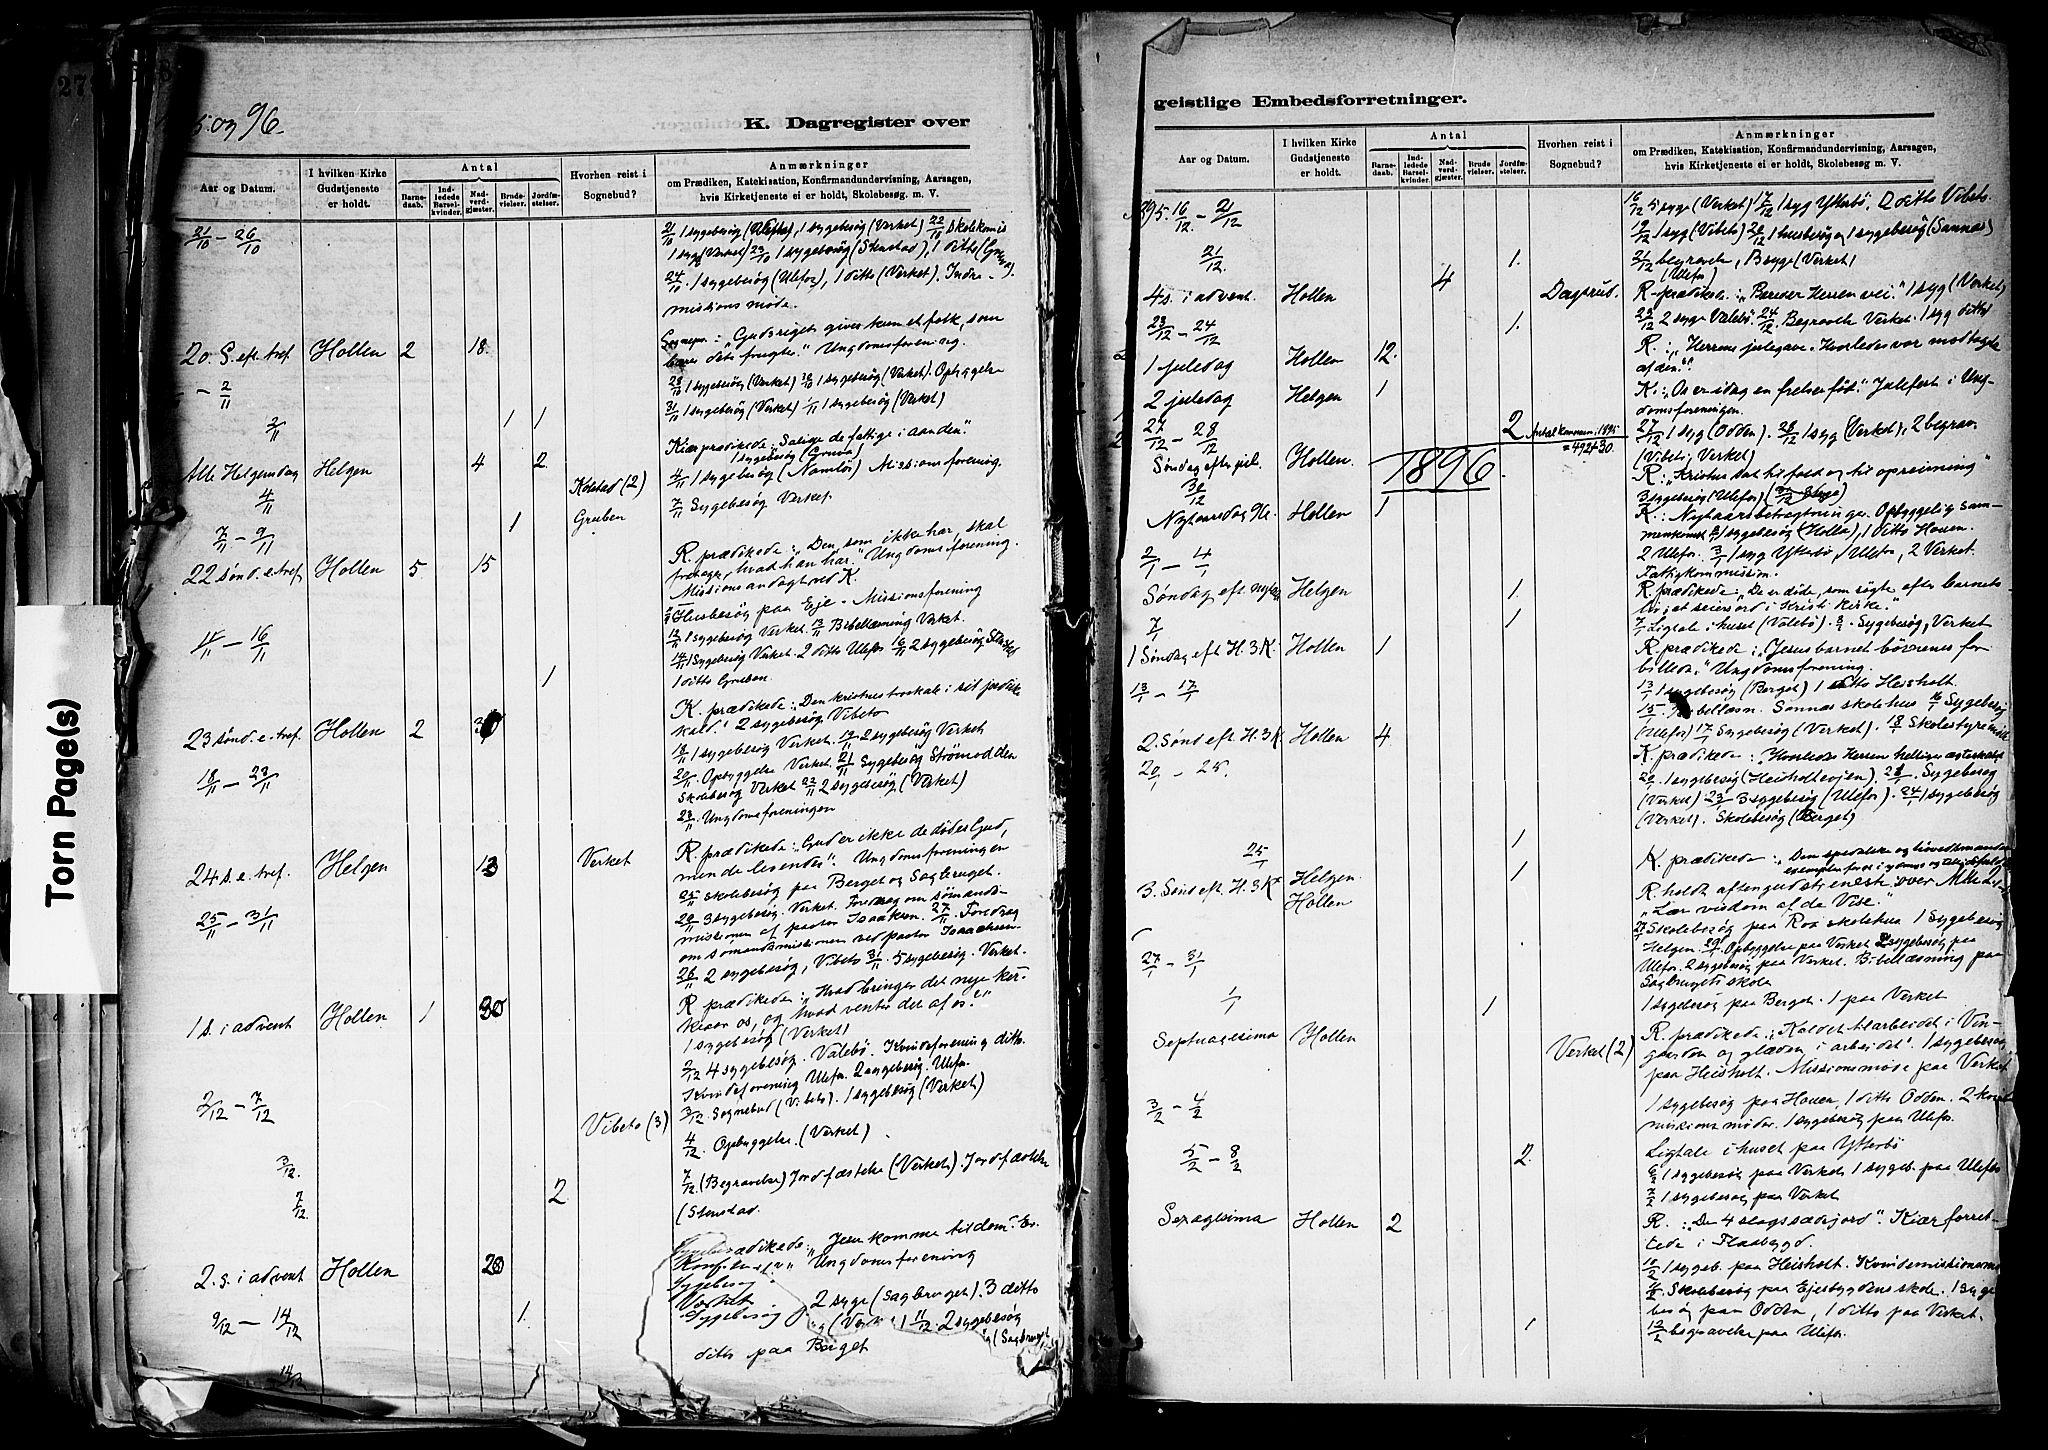 SAKO, Holla kirkebøker, F/Fa/L0008: Ministerialbok nr. 8, 1882-1897, s. 458